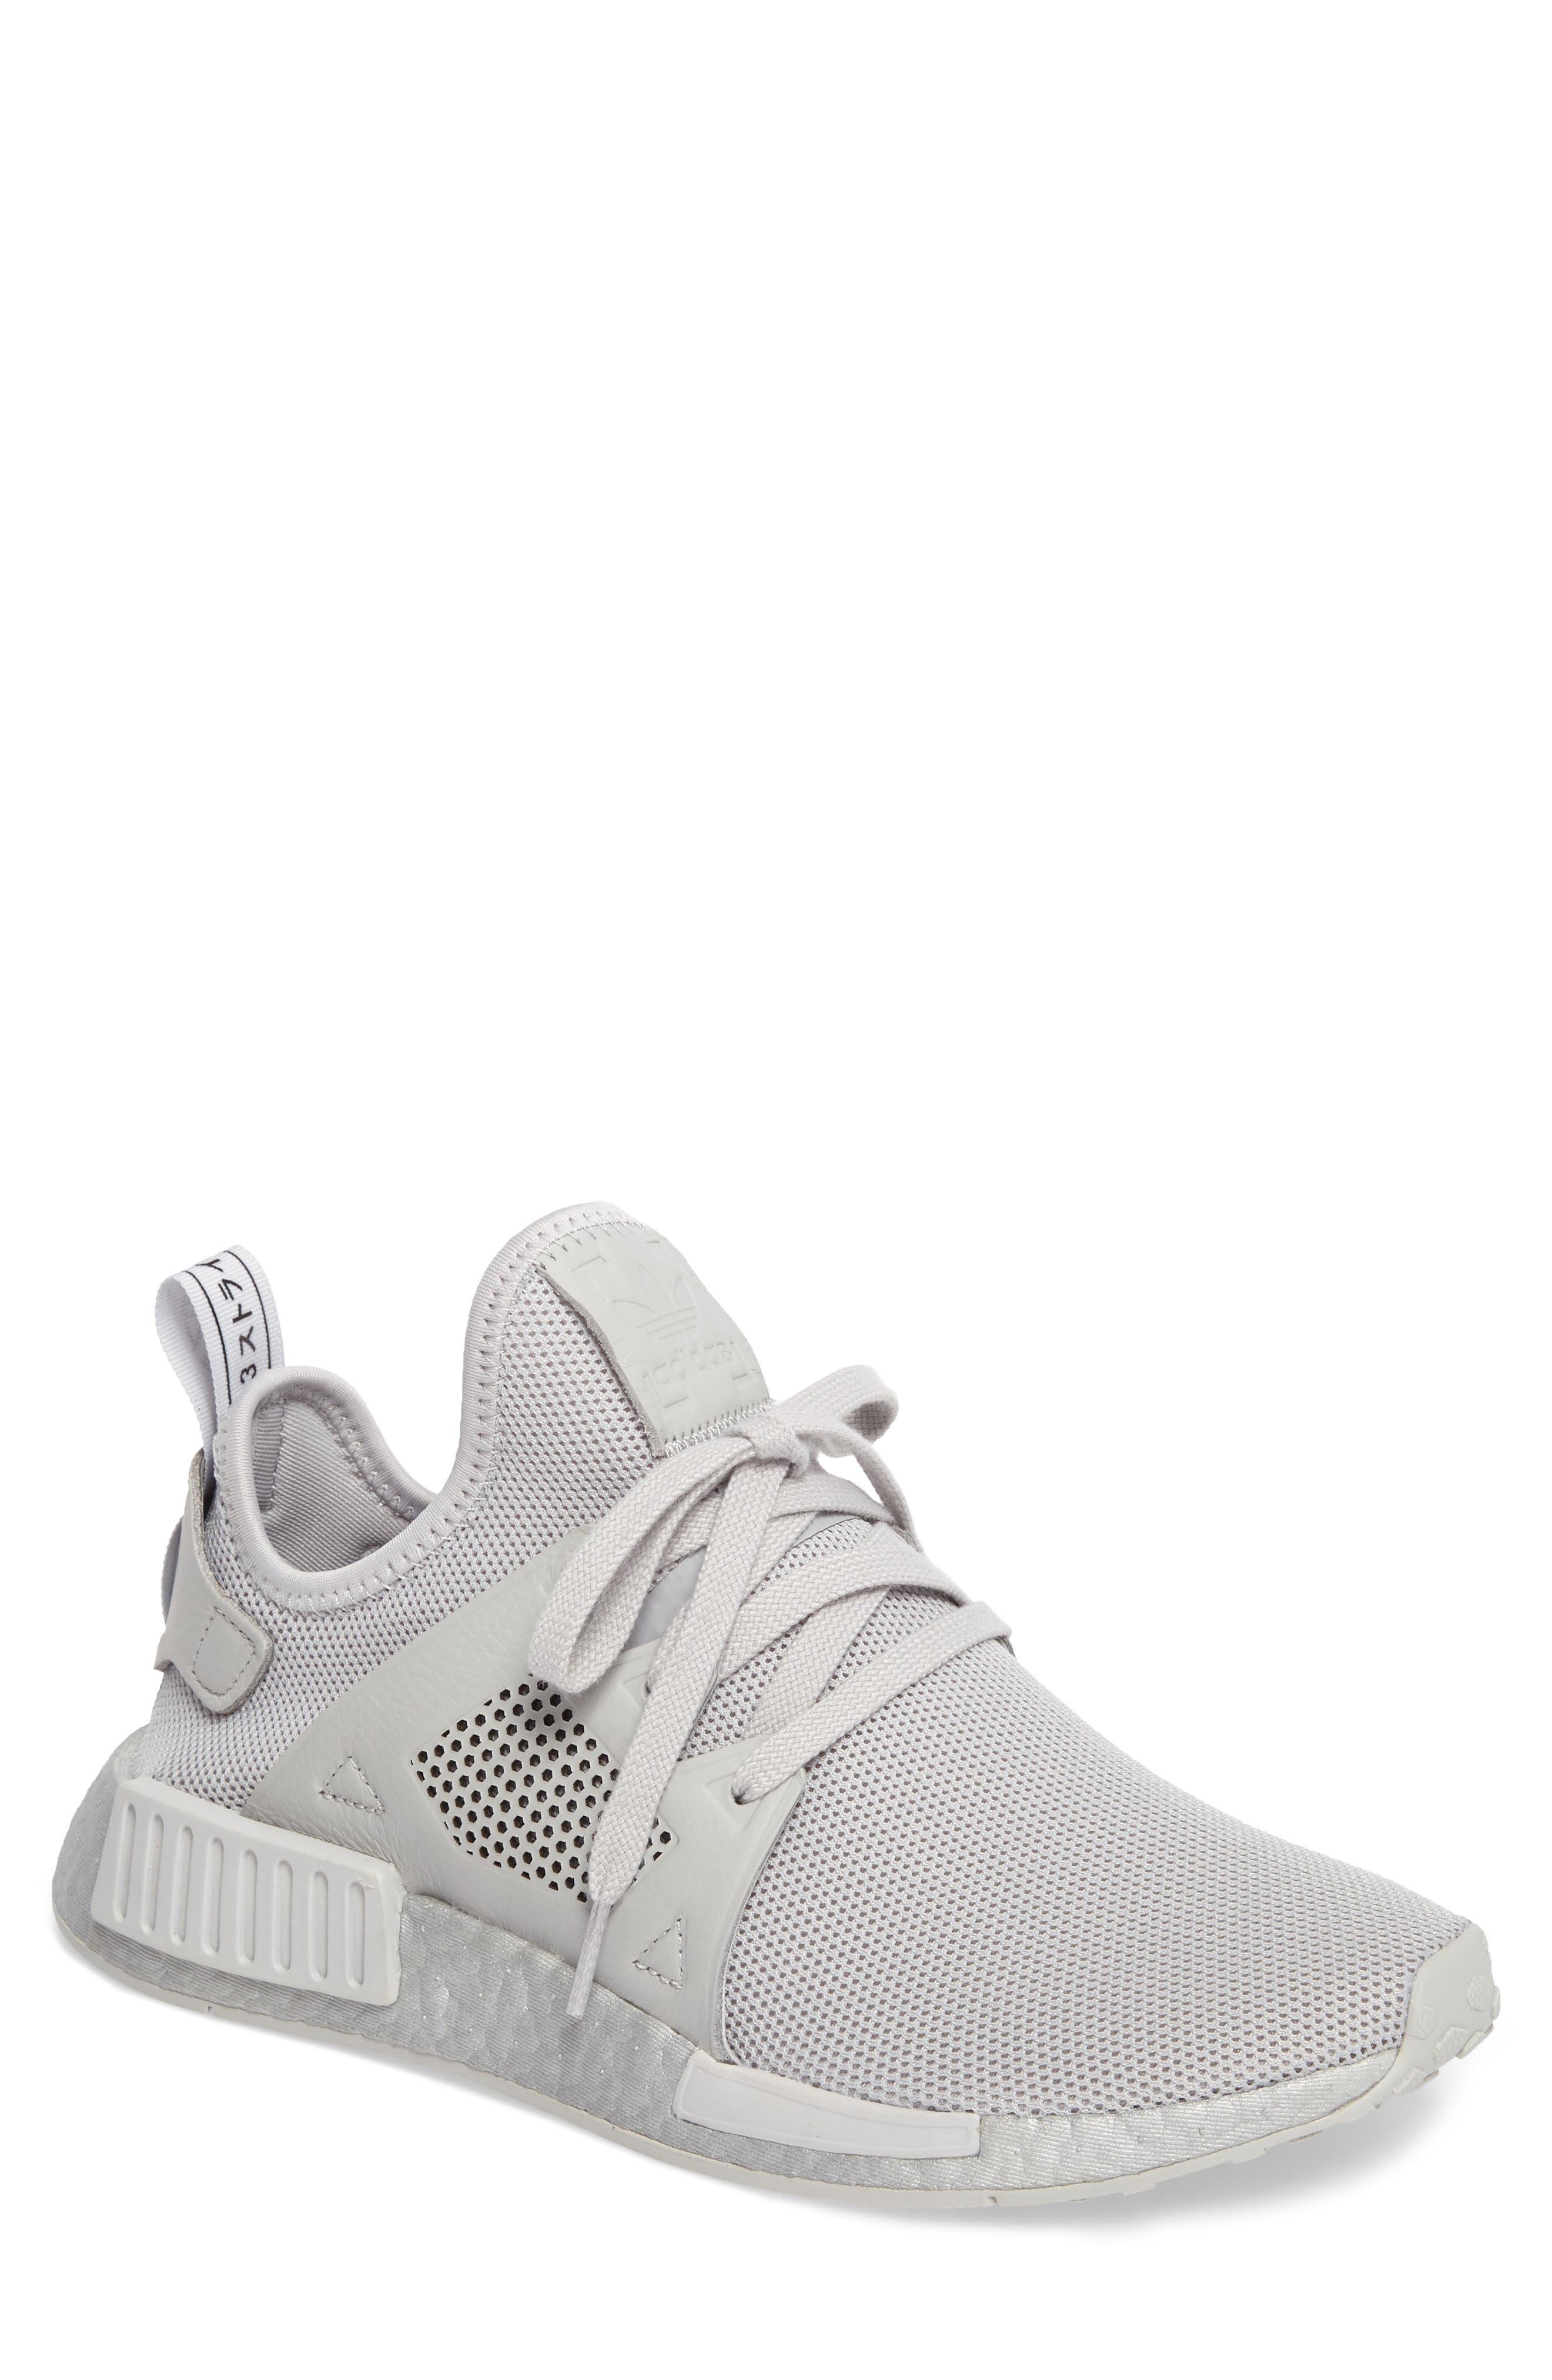 NMD XR1 Sneaker,                         Main,                         color, 020